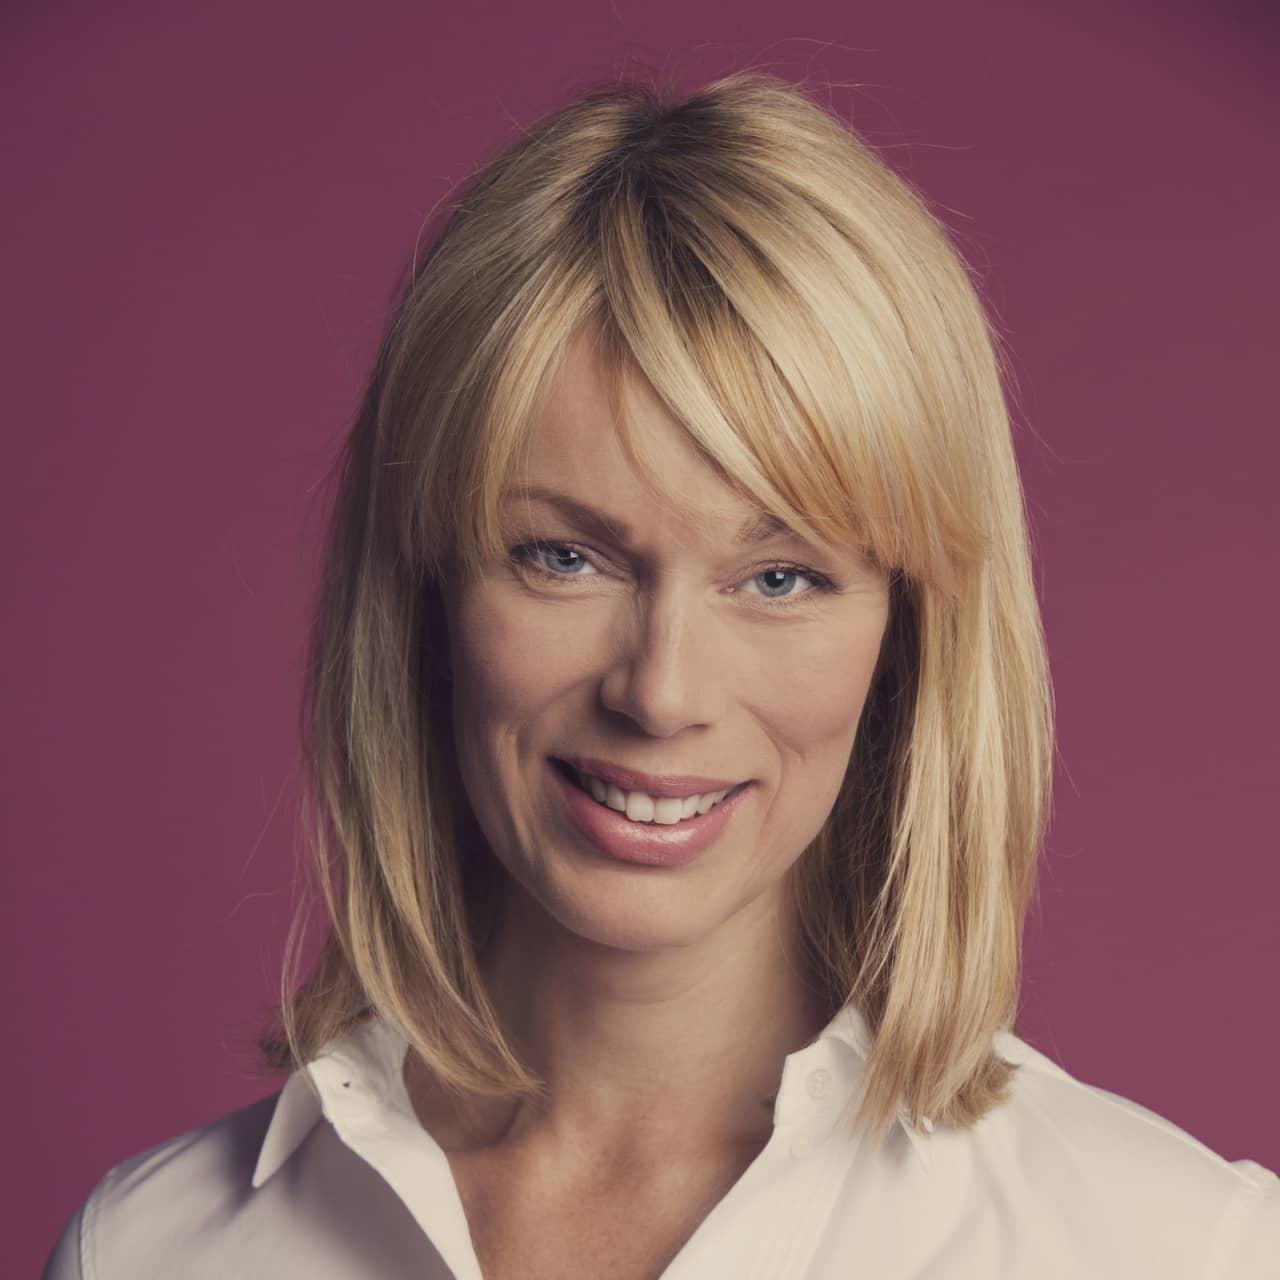 99. Malin Stråhle